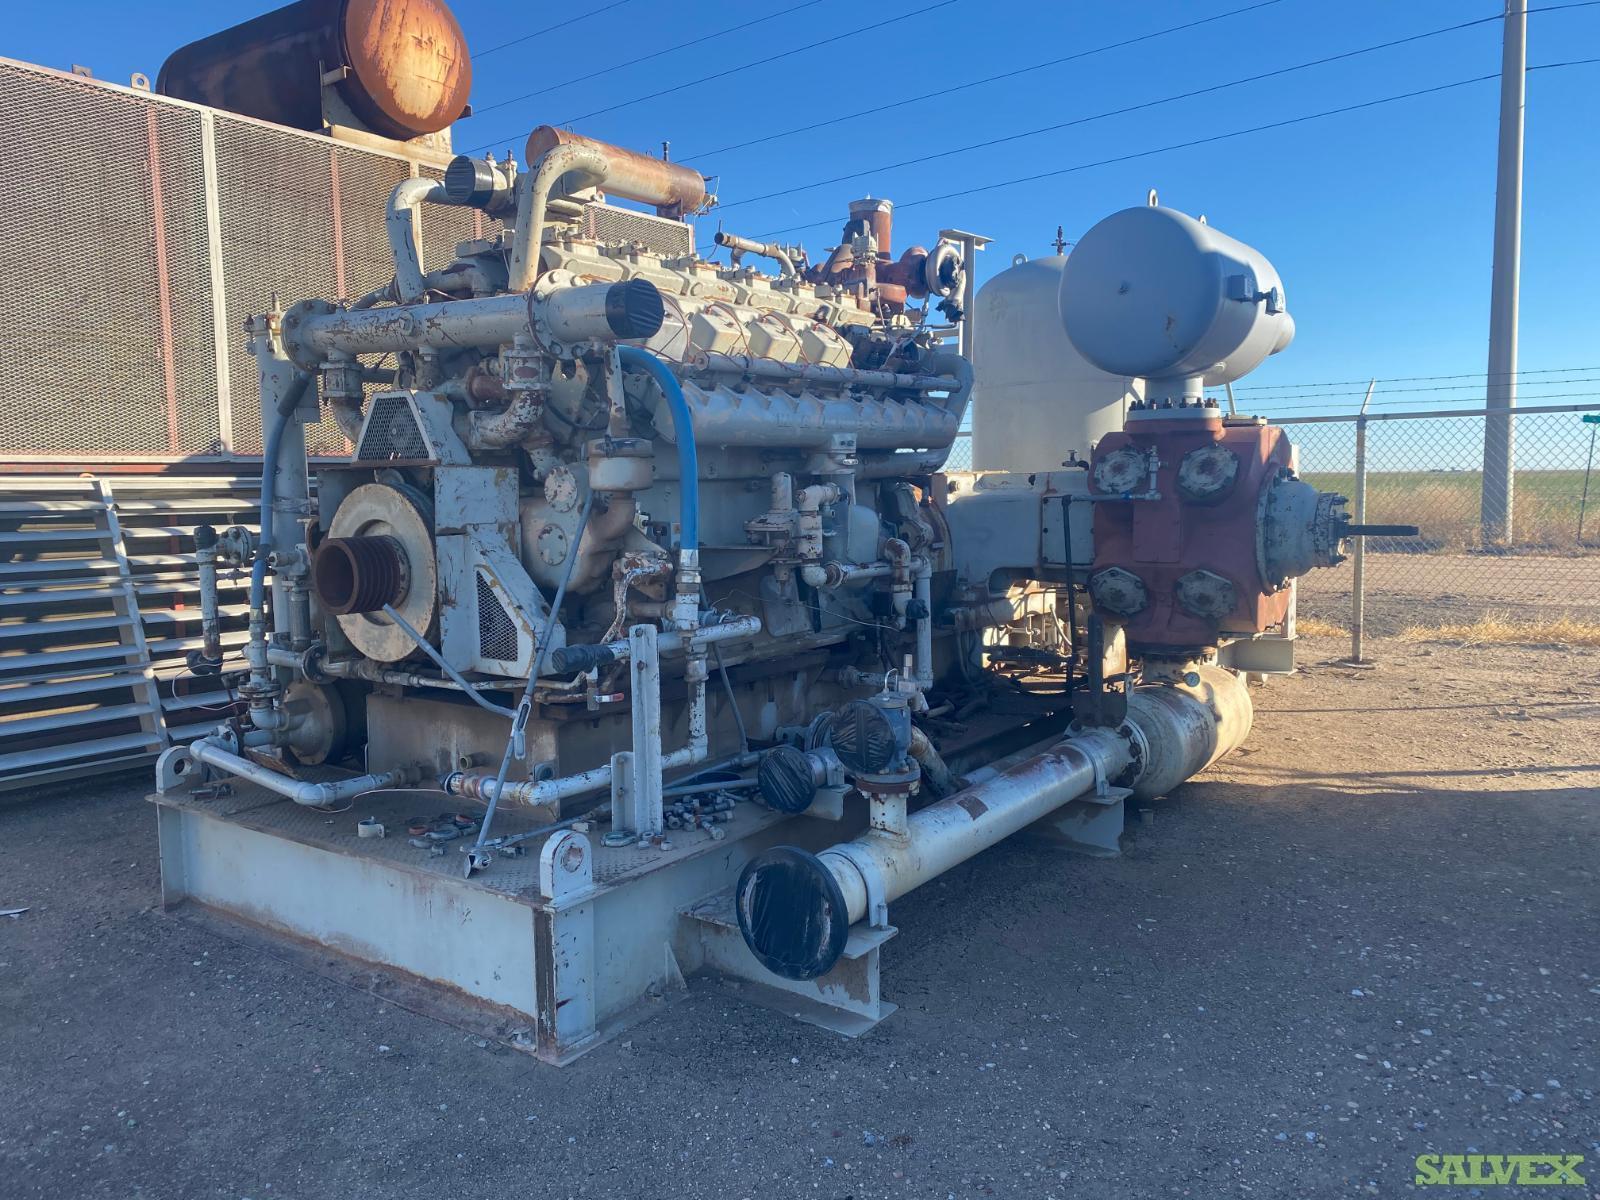 Waukesha Compressor Skids C-YRH-222 (Overhauled)